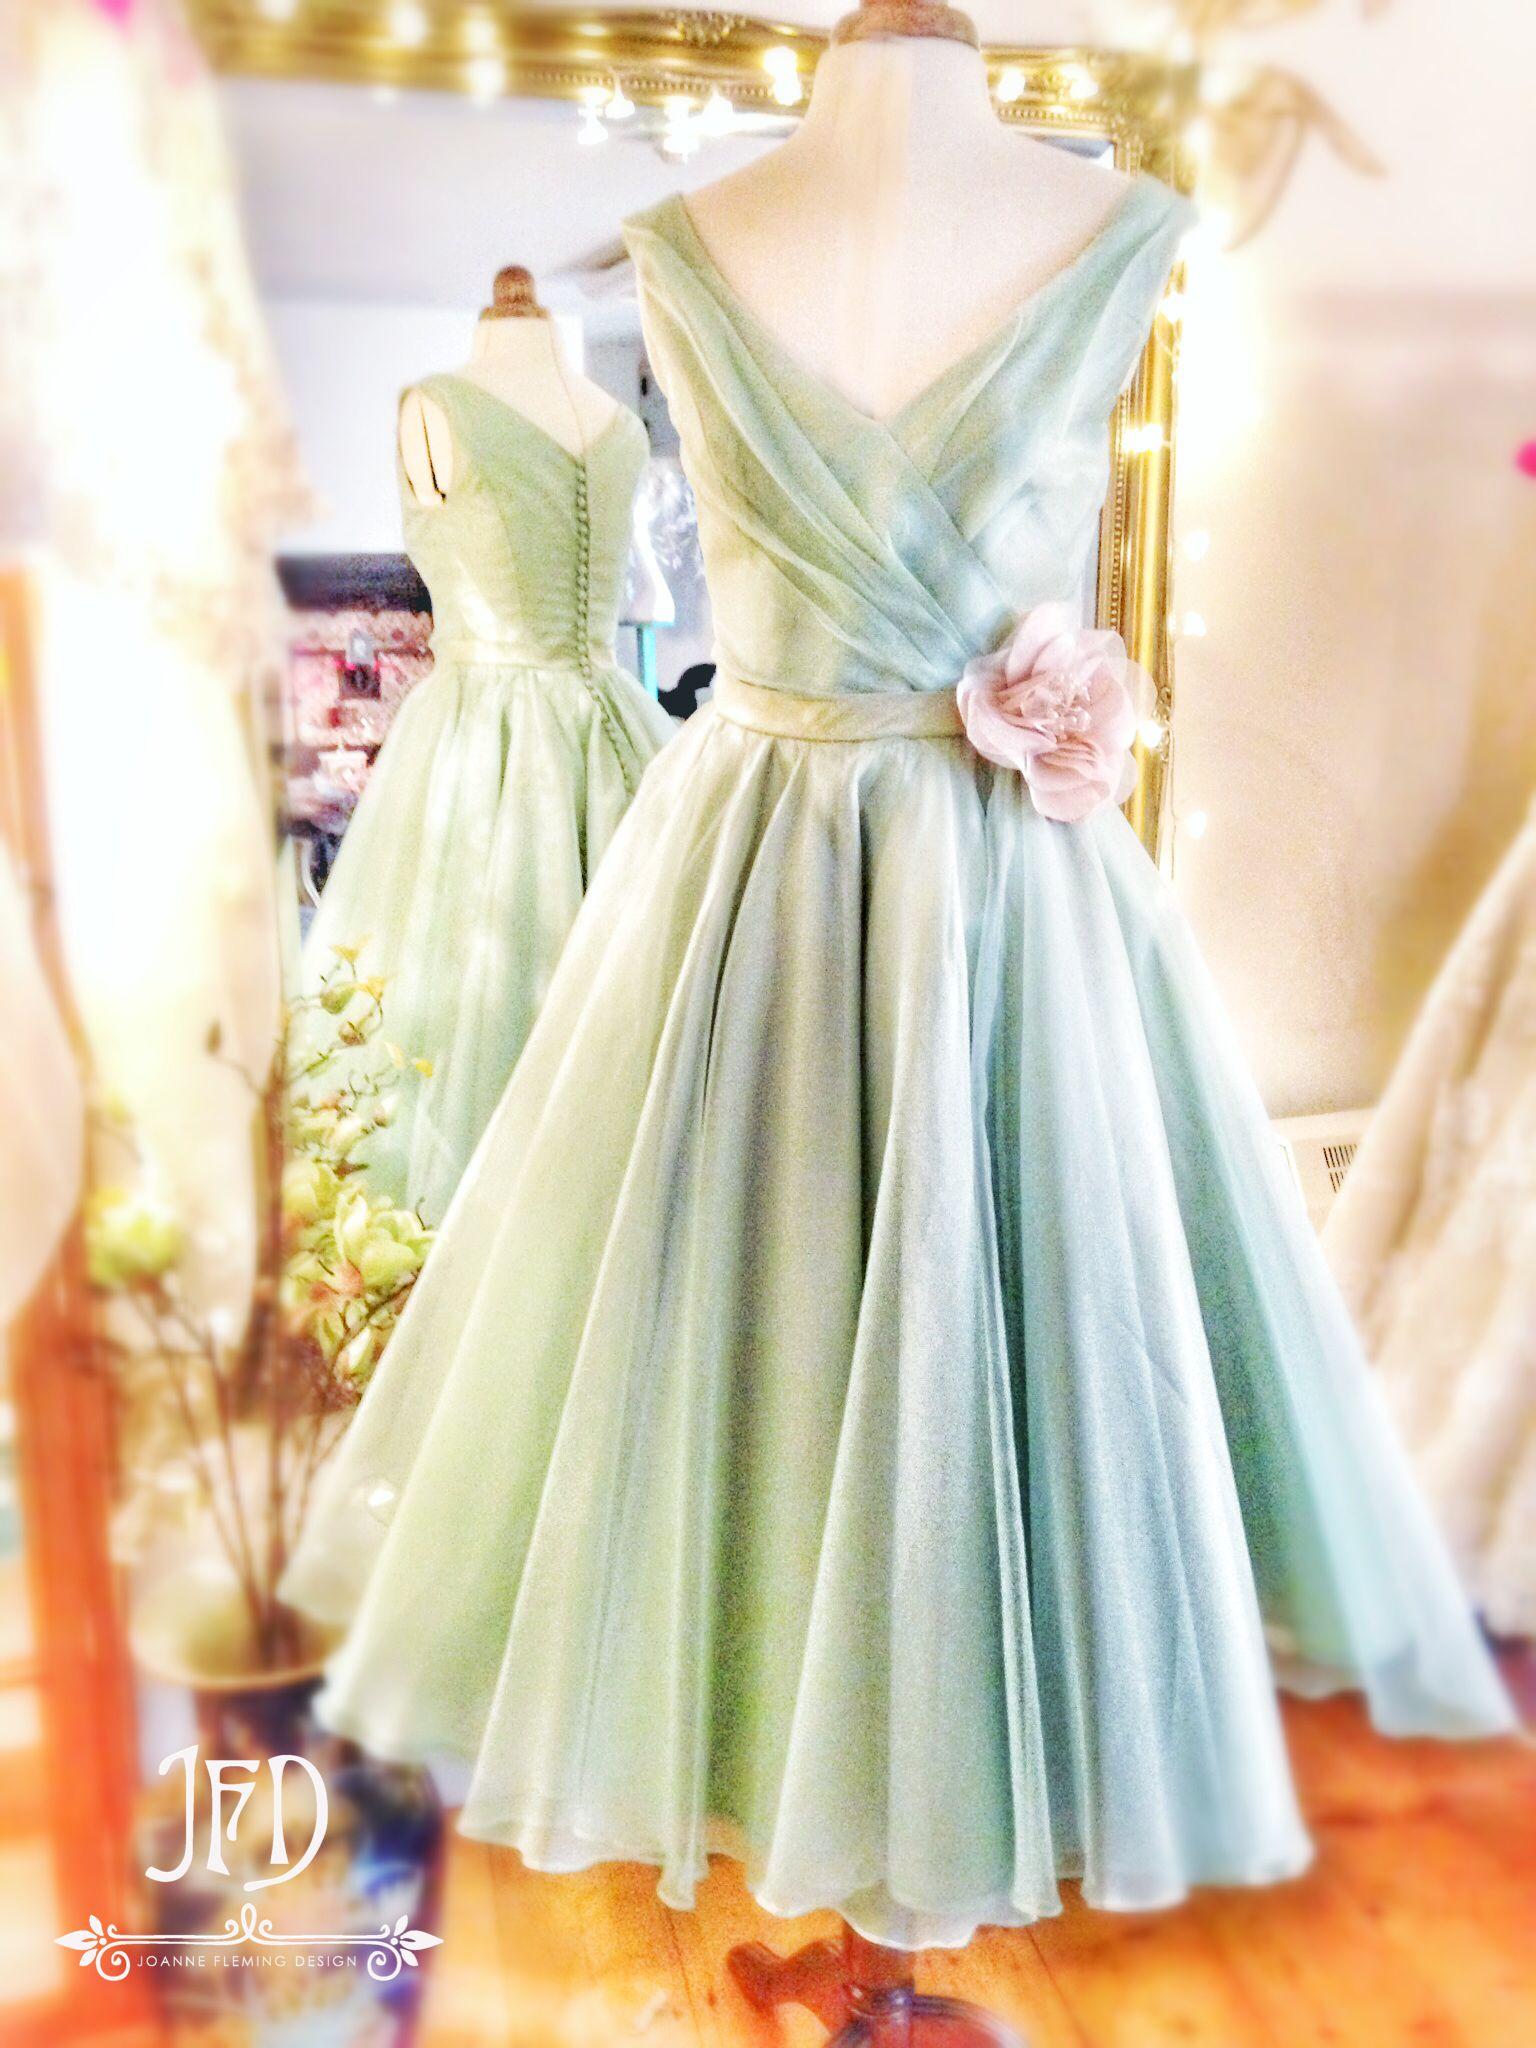 4e10a59916 Joanne Fleming Design; mint green and soft pink silk organza tea ...